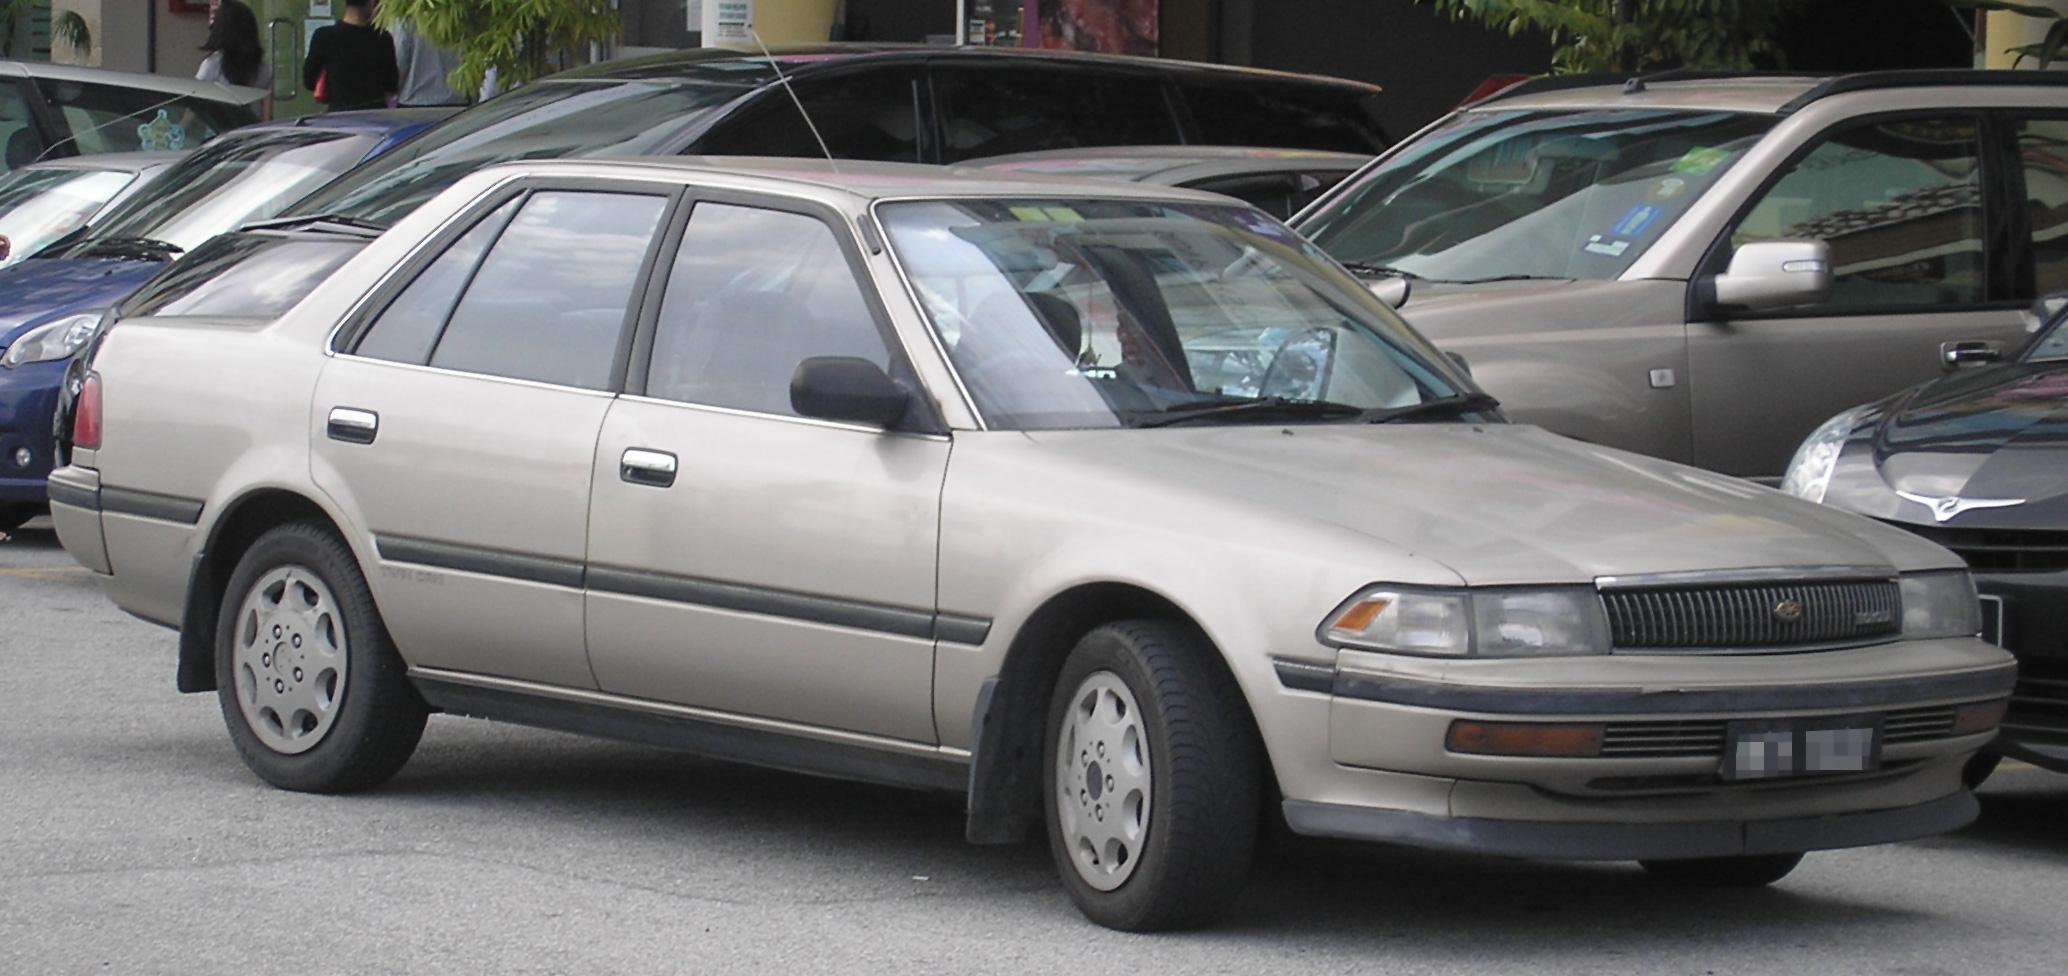 Toyota Carina ED I (T160) 1985 - 1989 Sedan-Hardtop #1